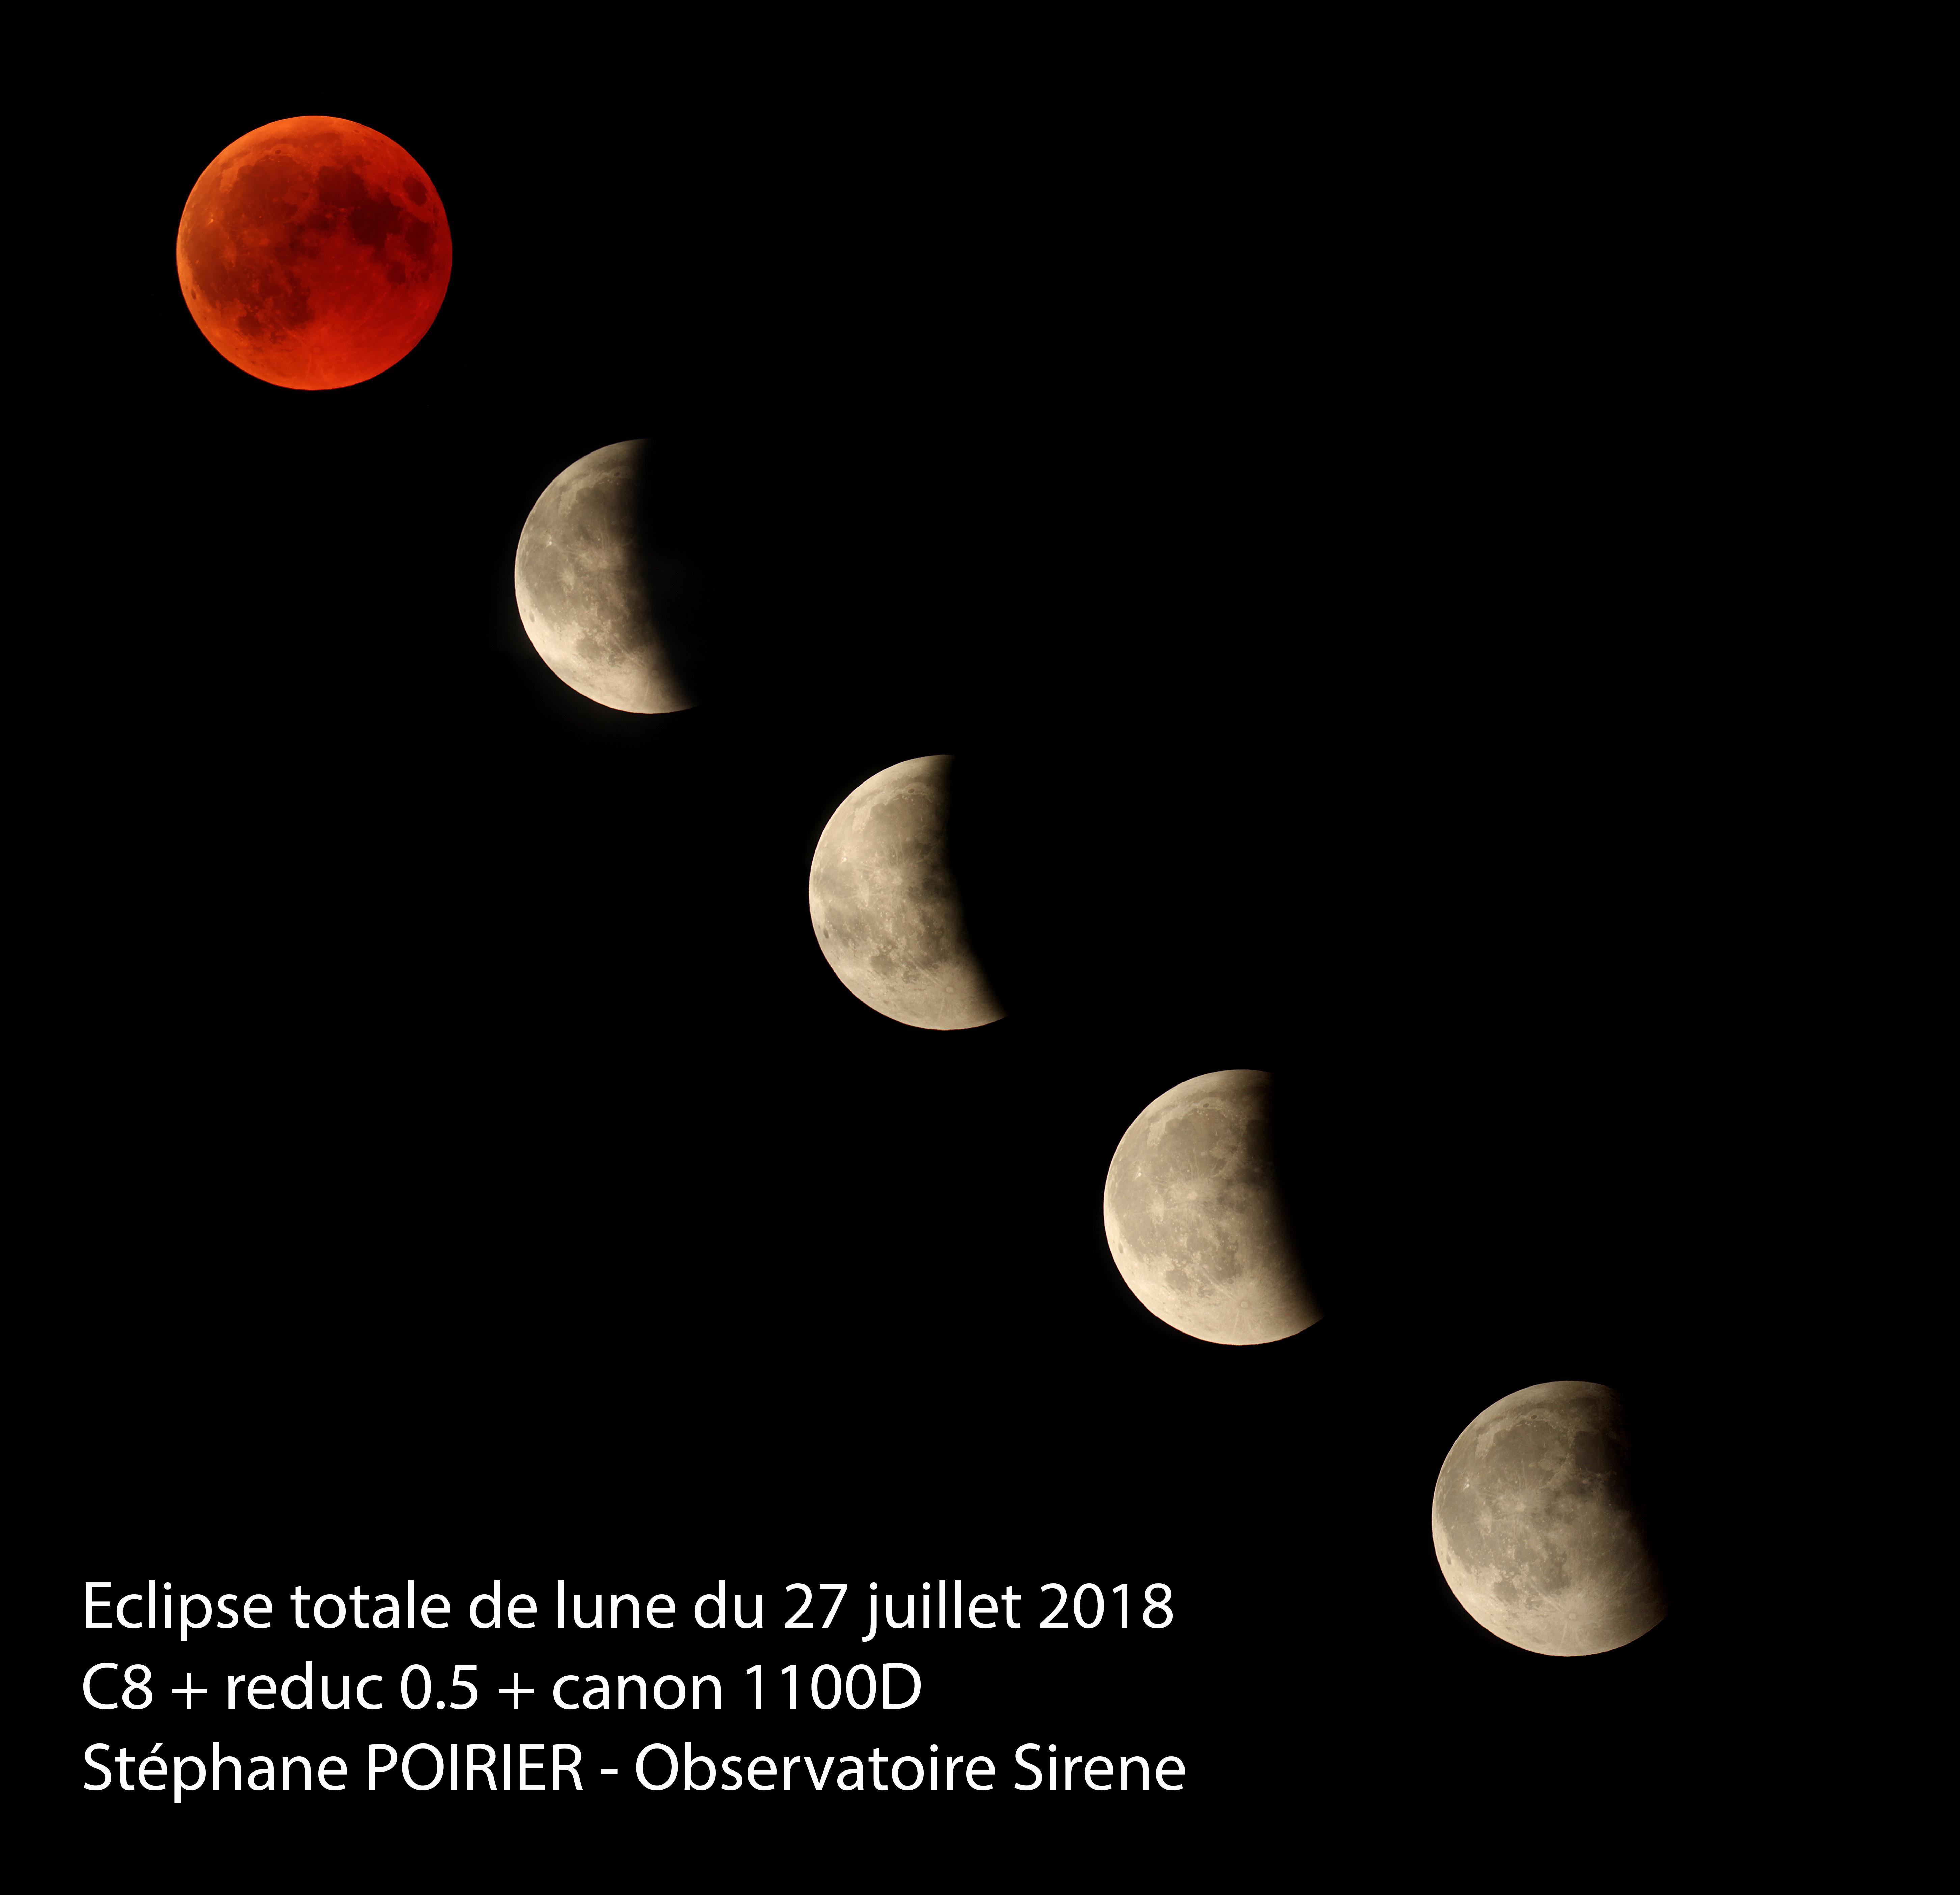 20180727-eclipse-lune-C8-red0.5-1100D-SP